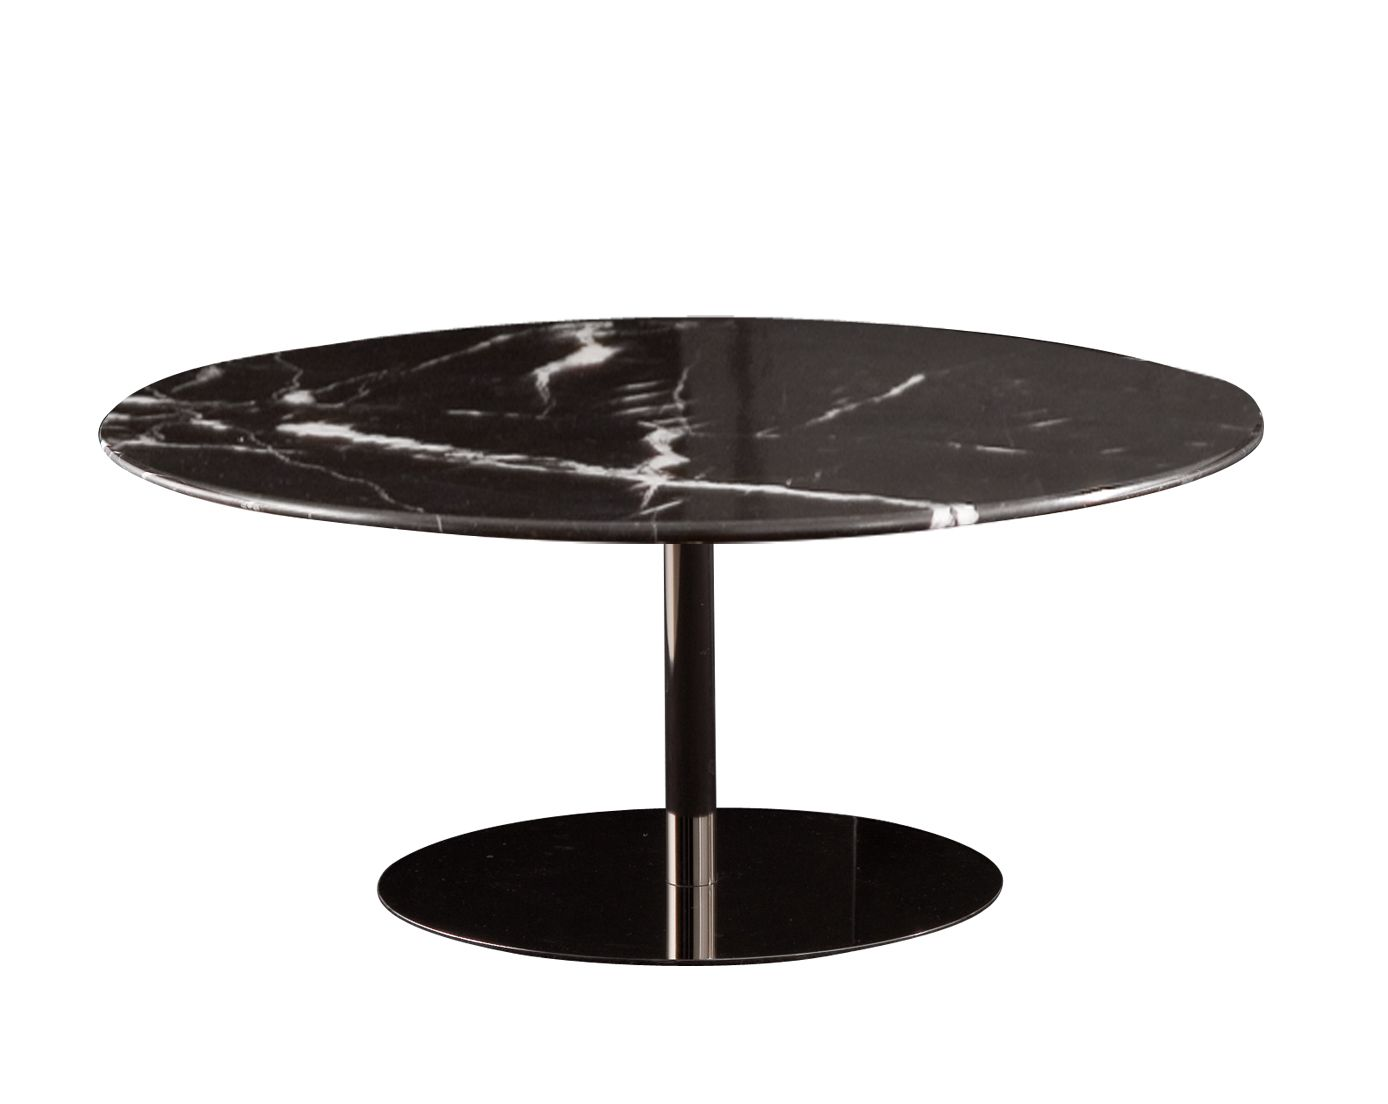 Bellagio Coffee Table by Minotti on ECC | DT - Insp | Pinterest